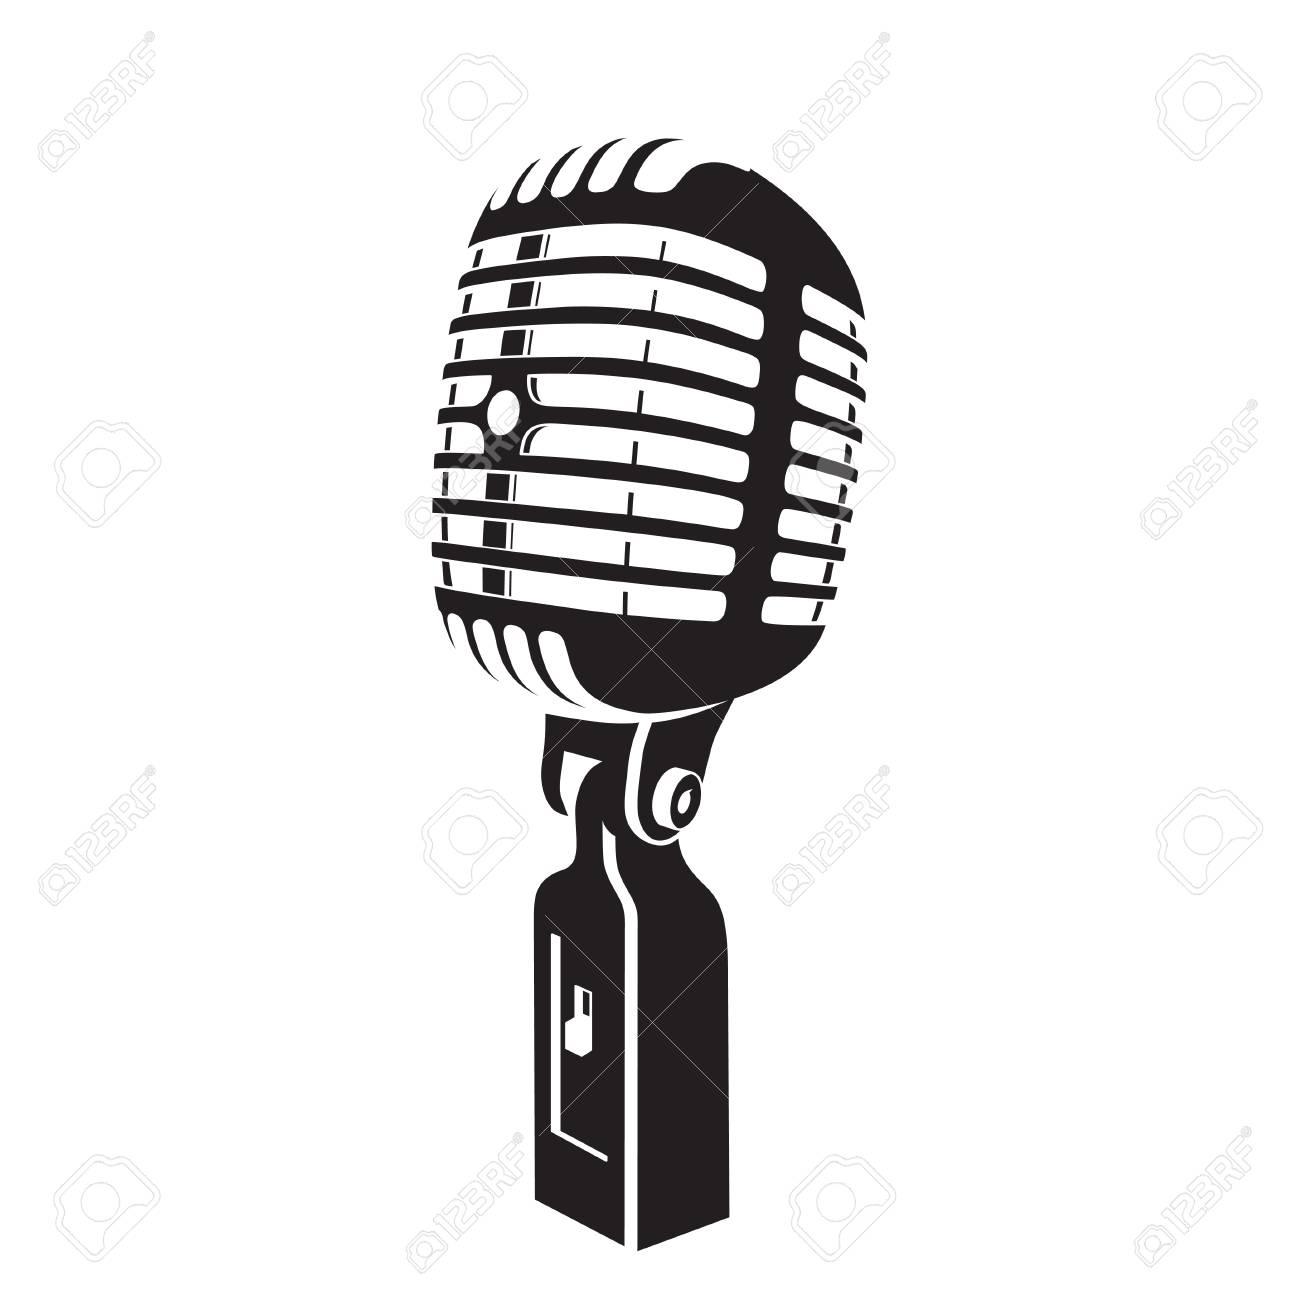 Retro Microphone Tattoo by Metacharis on deviantART | Microphone tattoo, Old  school tattoo, Music tattoos